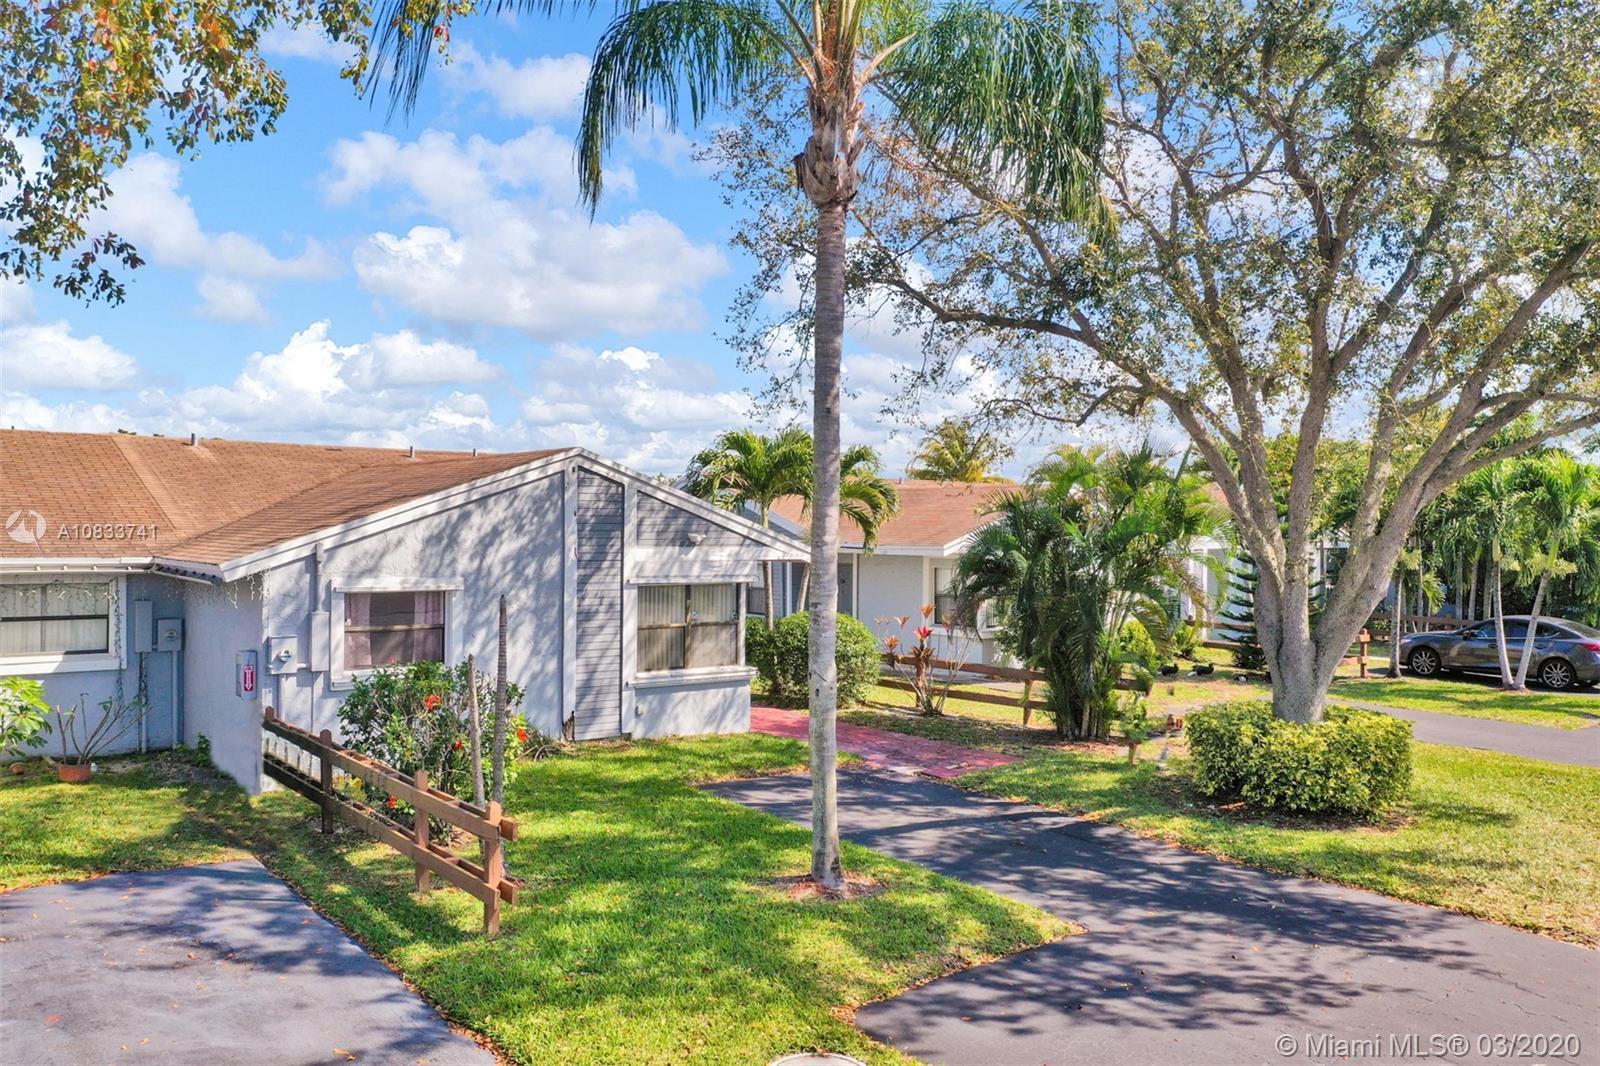 8017 NW 41st Ct #8017, Sunrise, FL 33351 - Sunrise, FL real estate listing